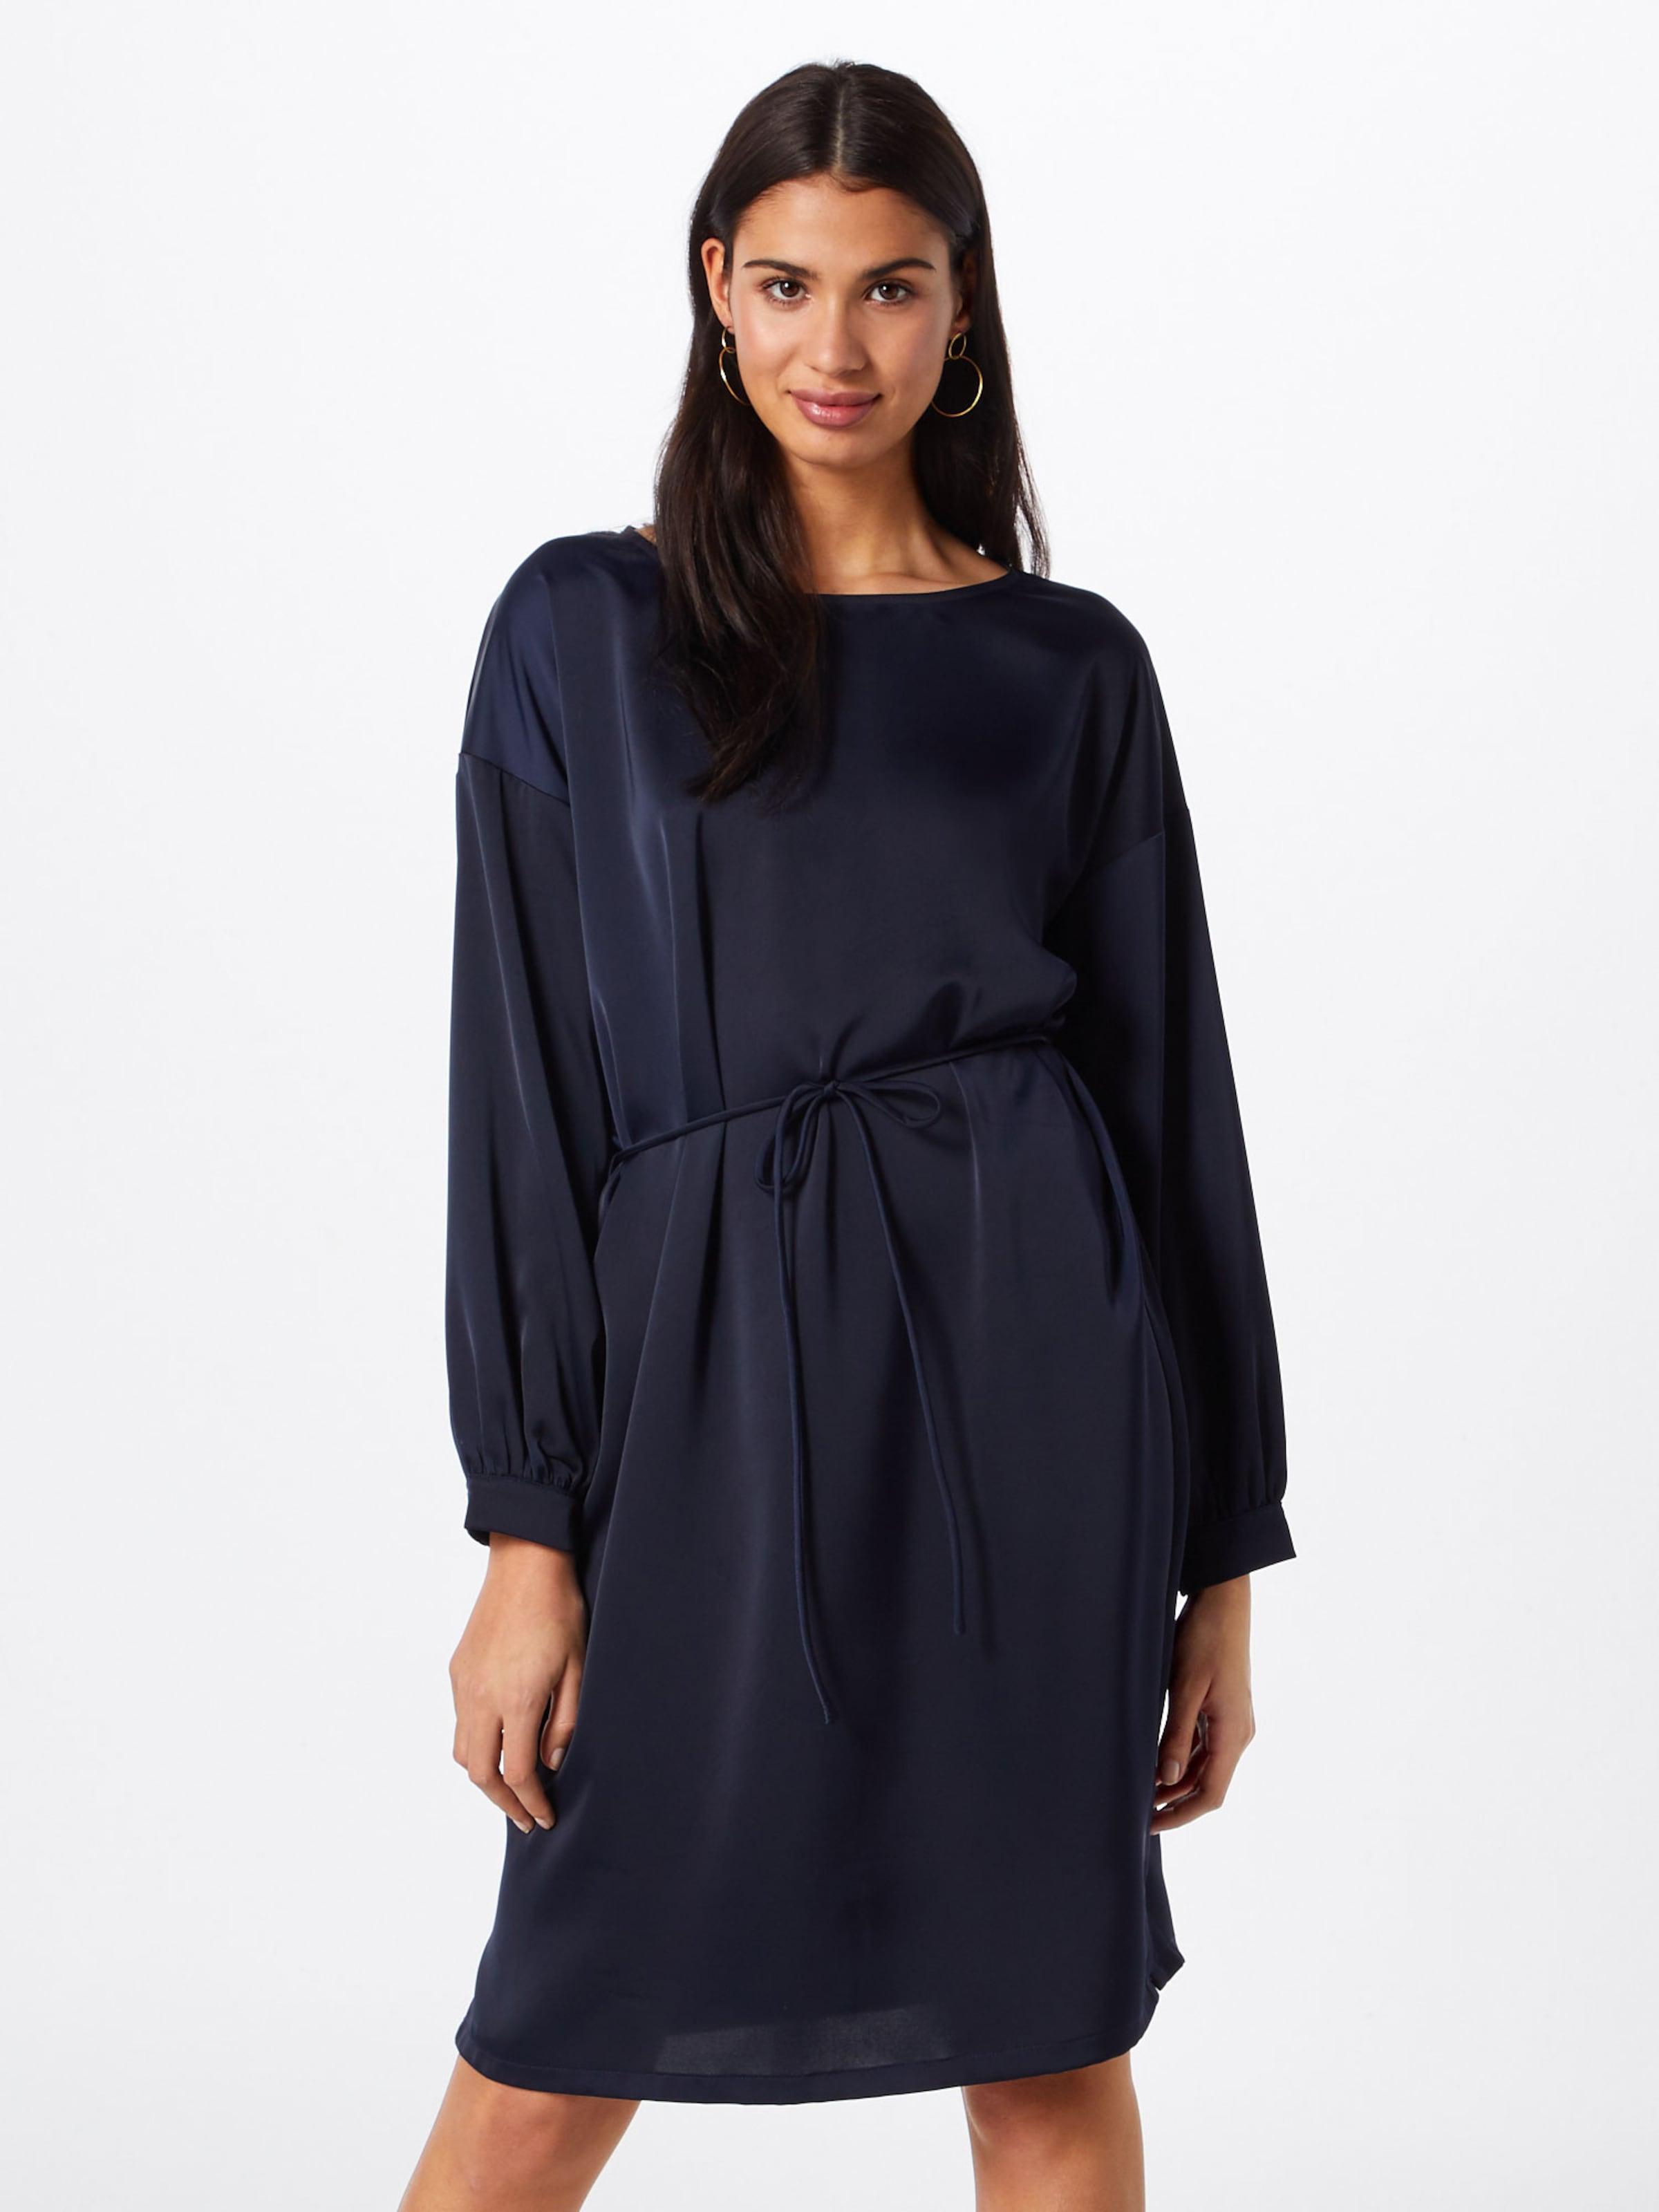 Navy 'love269' Divine Loveamp; Kleid In mnywvN08OP